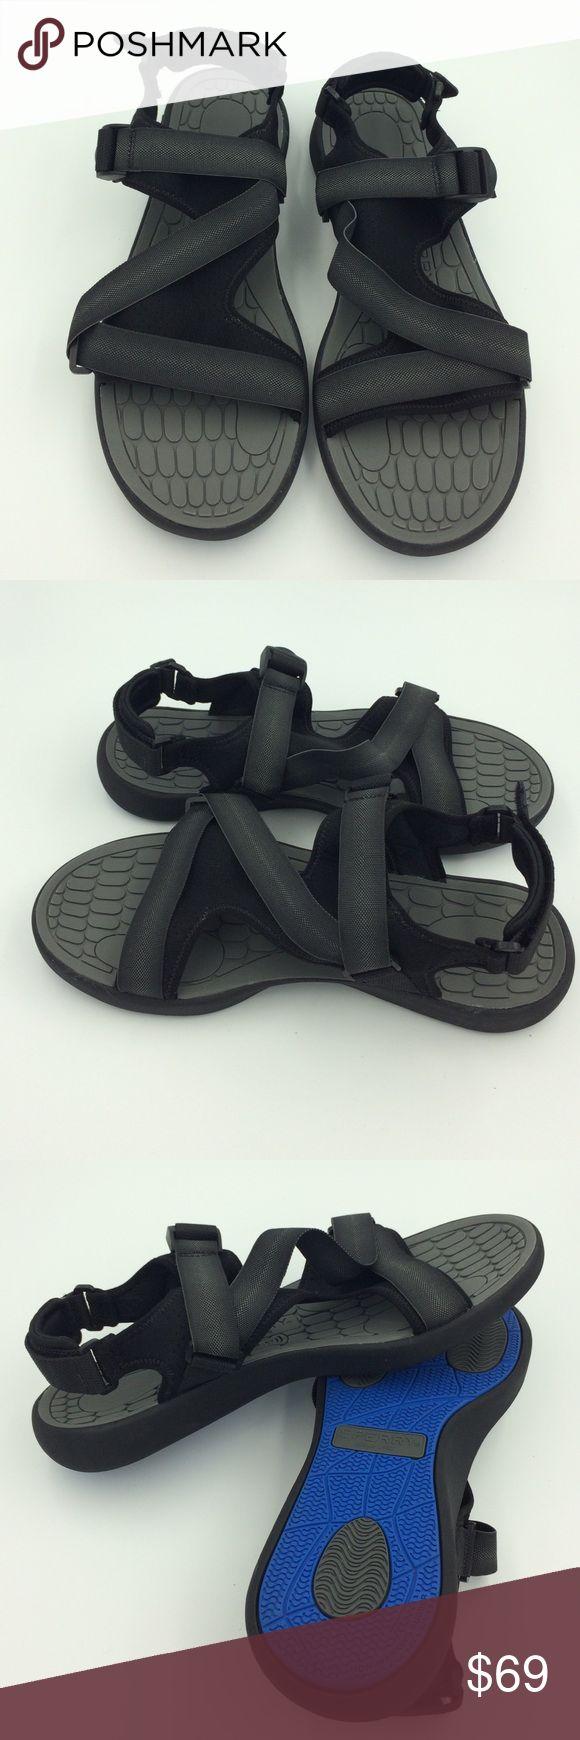 Black sandals size 11 -  Black Straps Sperry Sandal Size 11 12 13 B3 New Never Worn Black